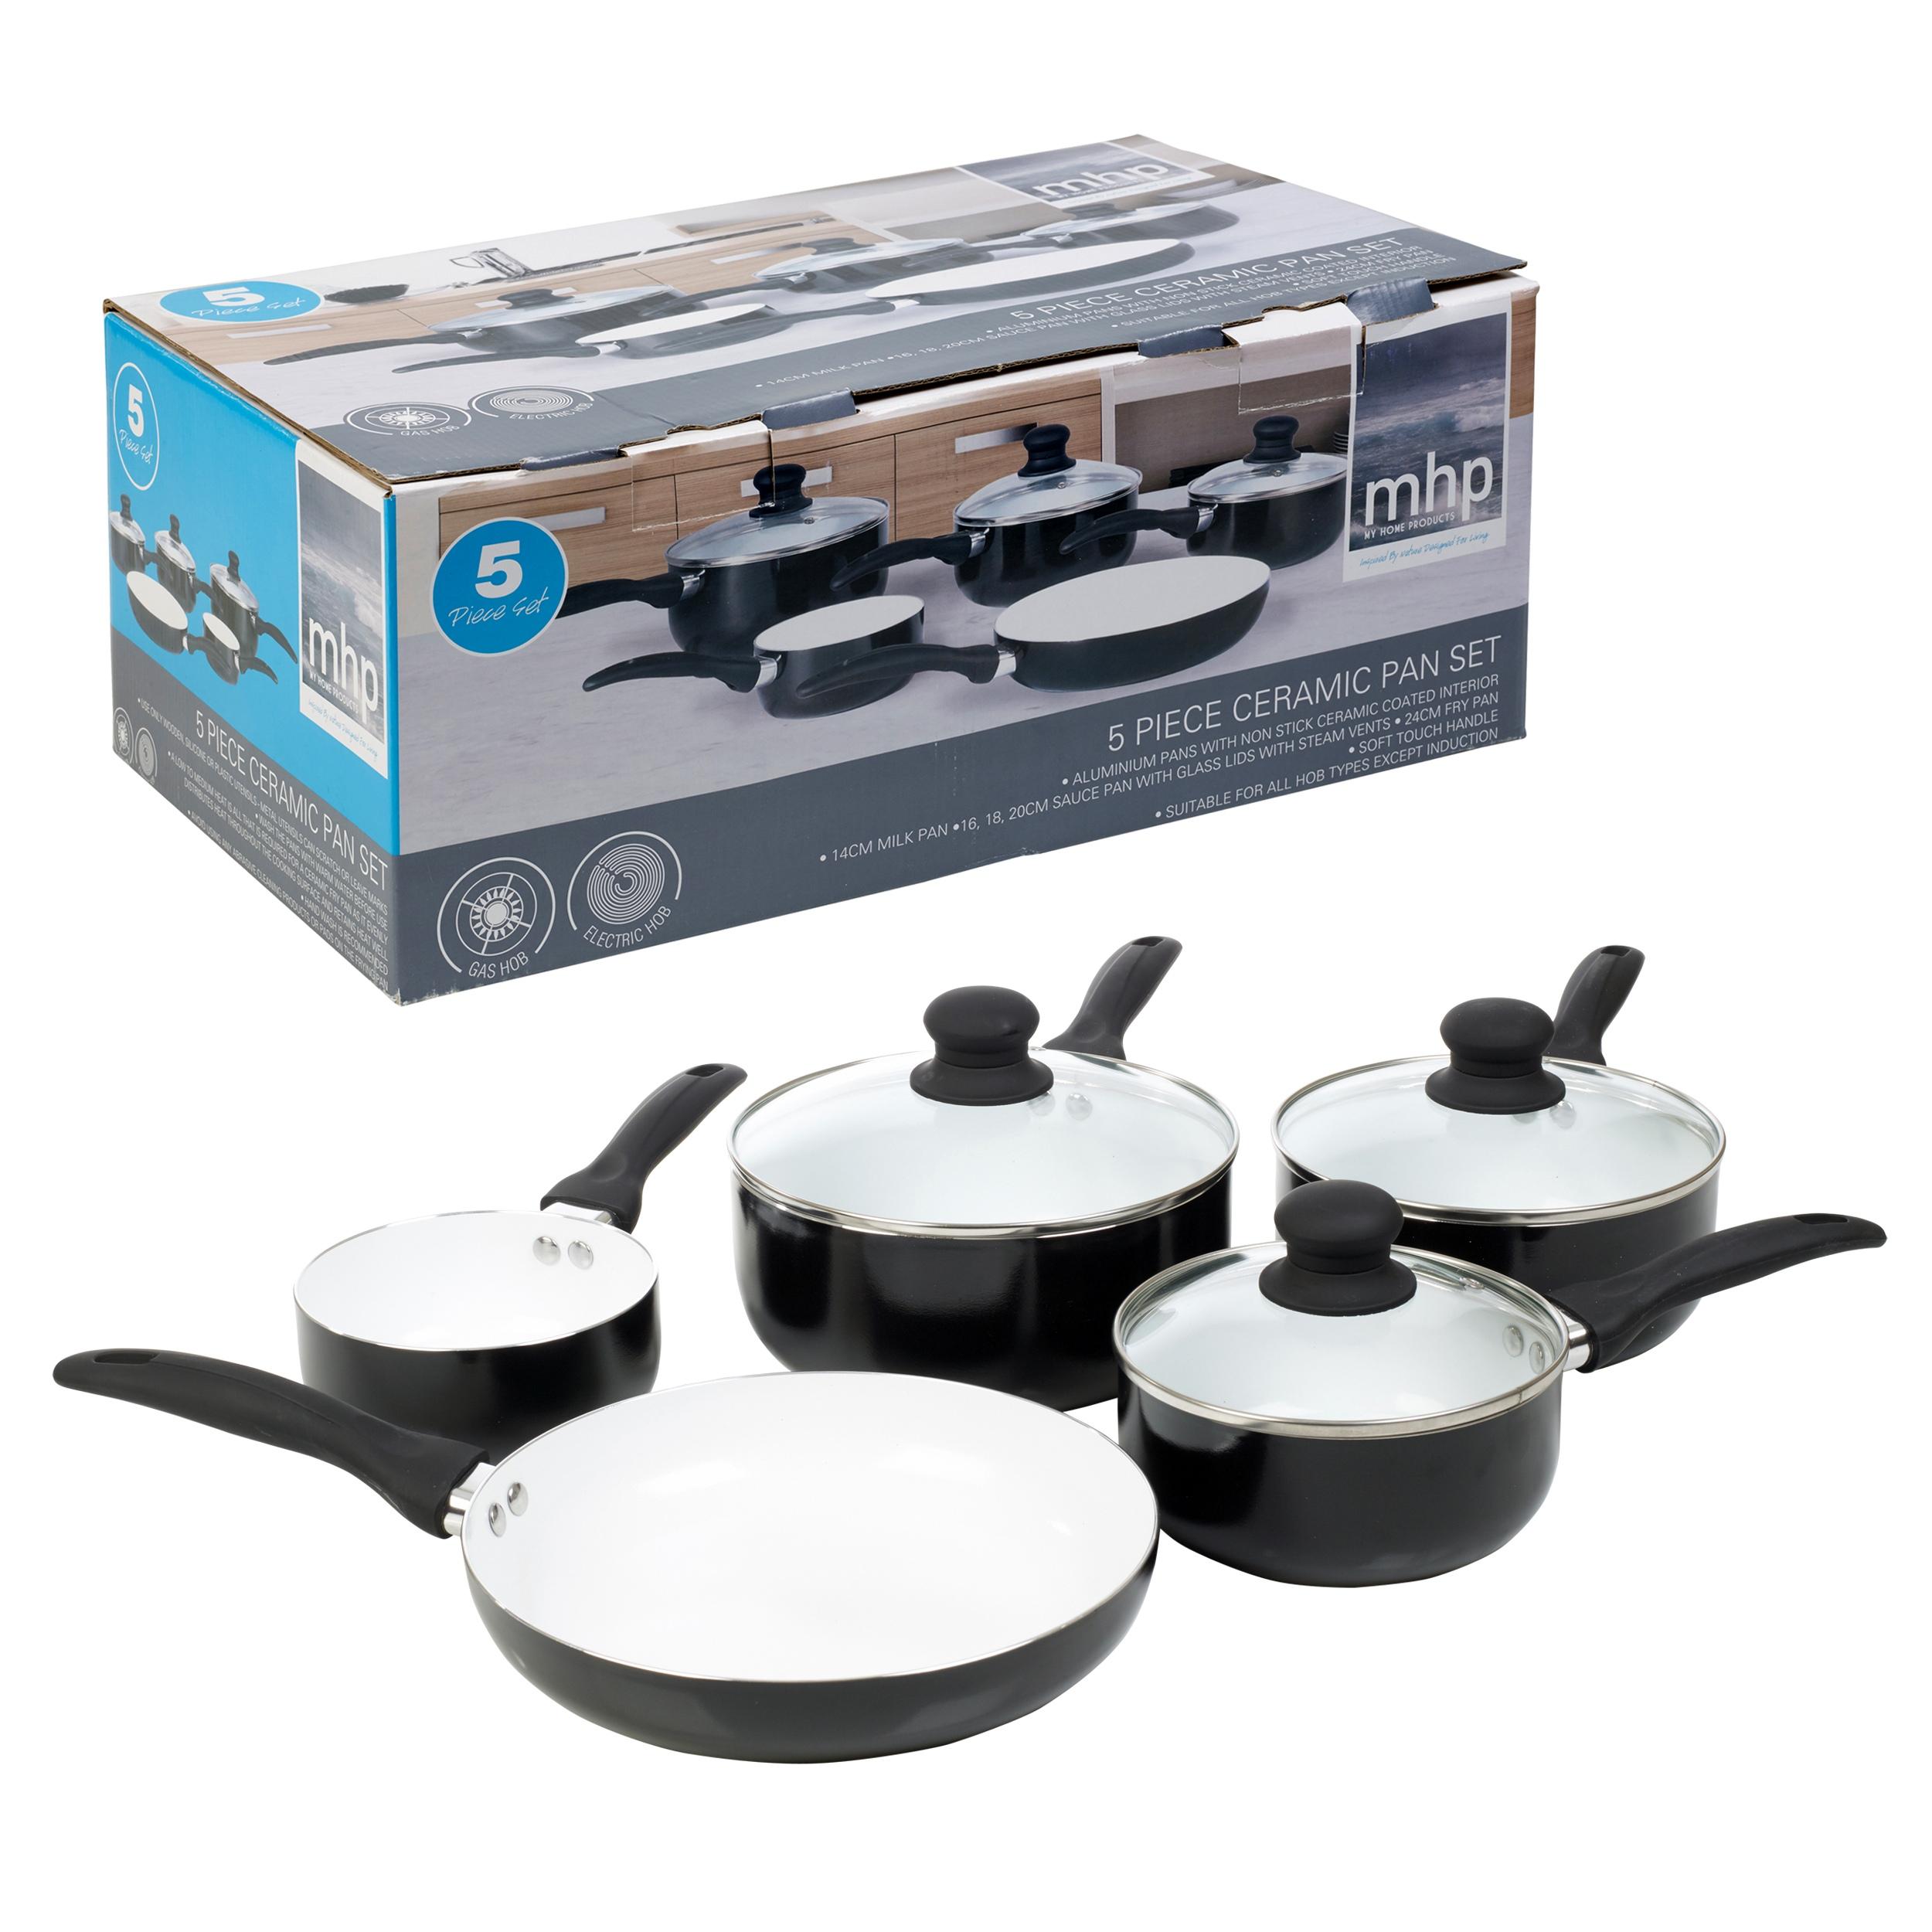 Utensilios cocina ollas sartenes antiadherentes cer mica 5 for Utensilios de cocina de ceramica